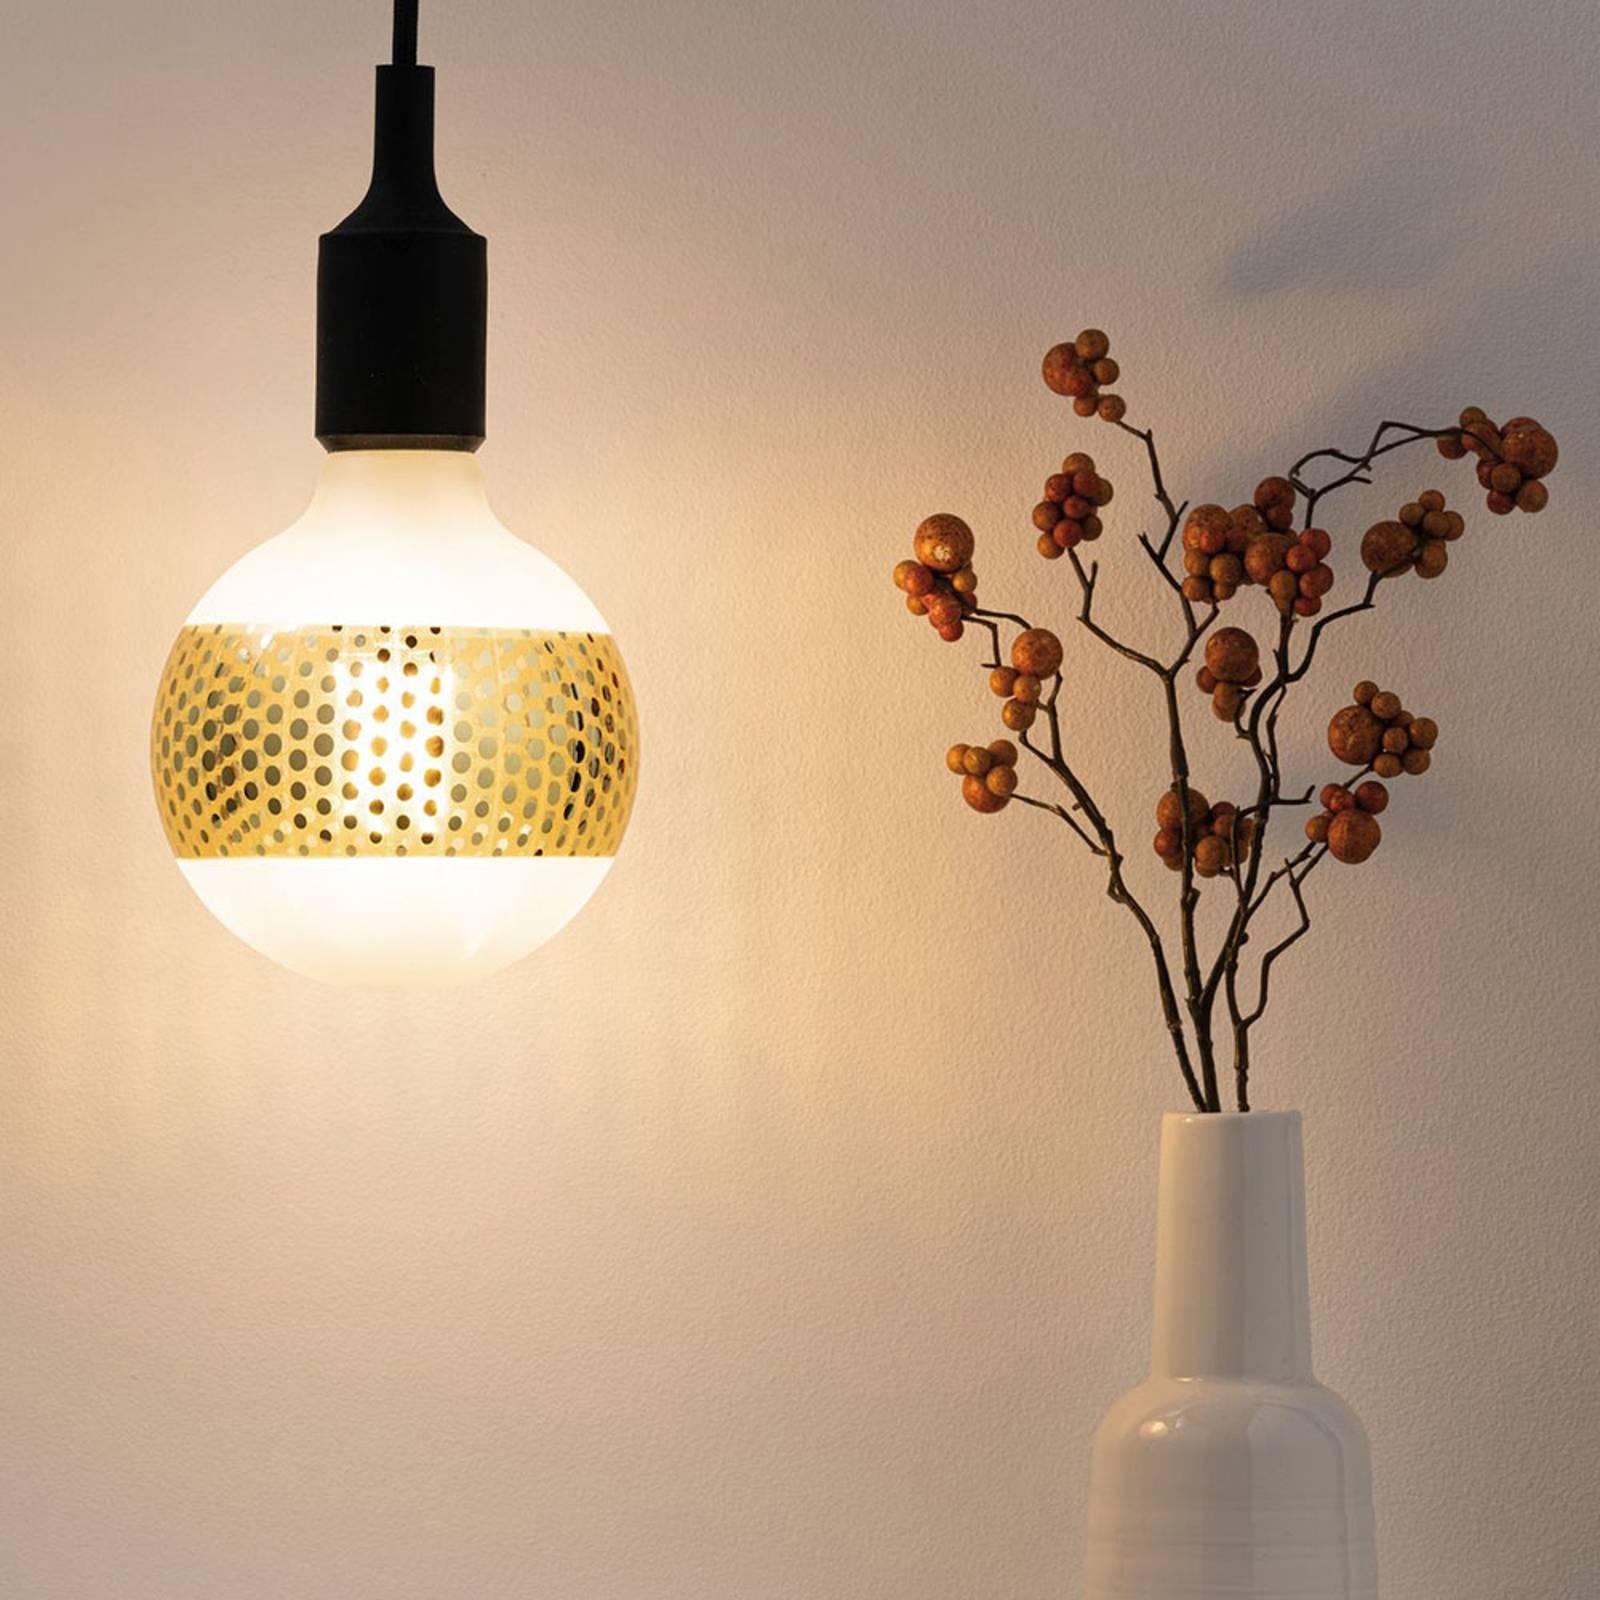 Paulmann E27 LED-globe 4,5W rengaspeili, kulta